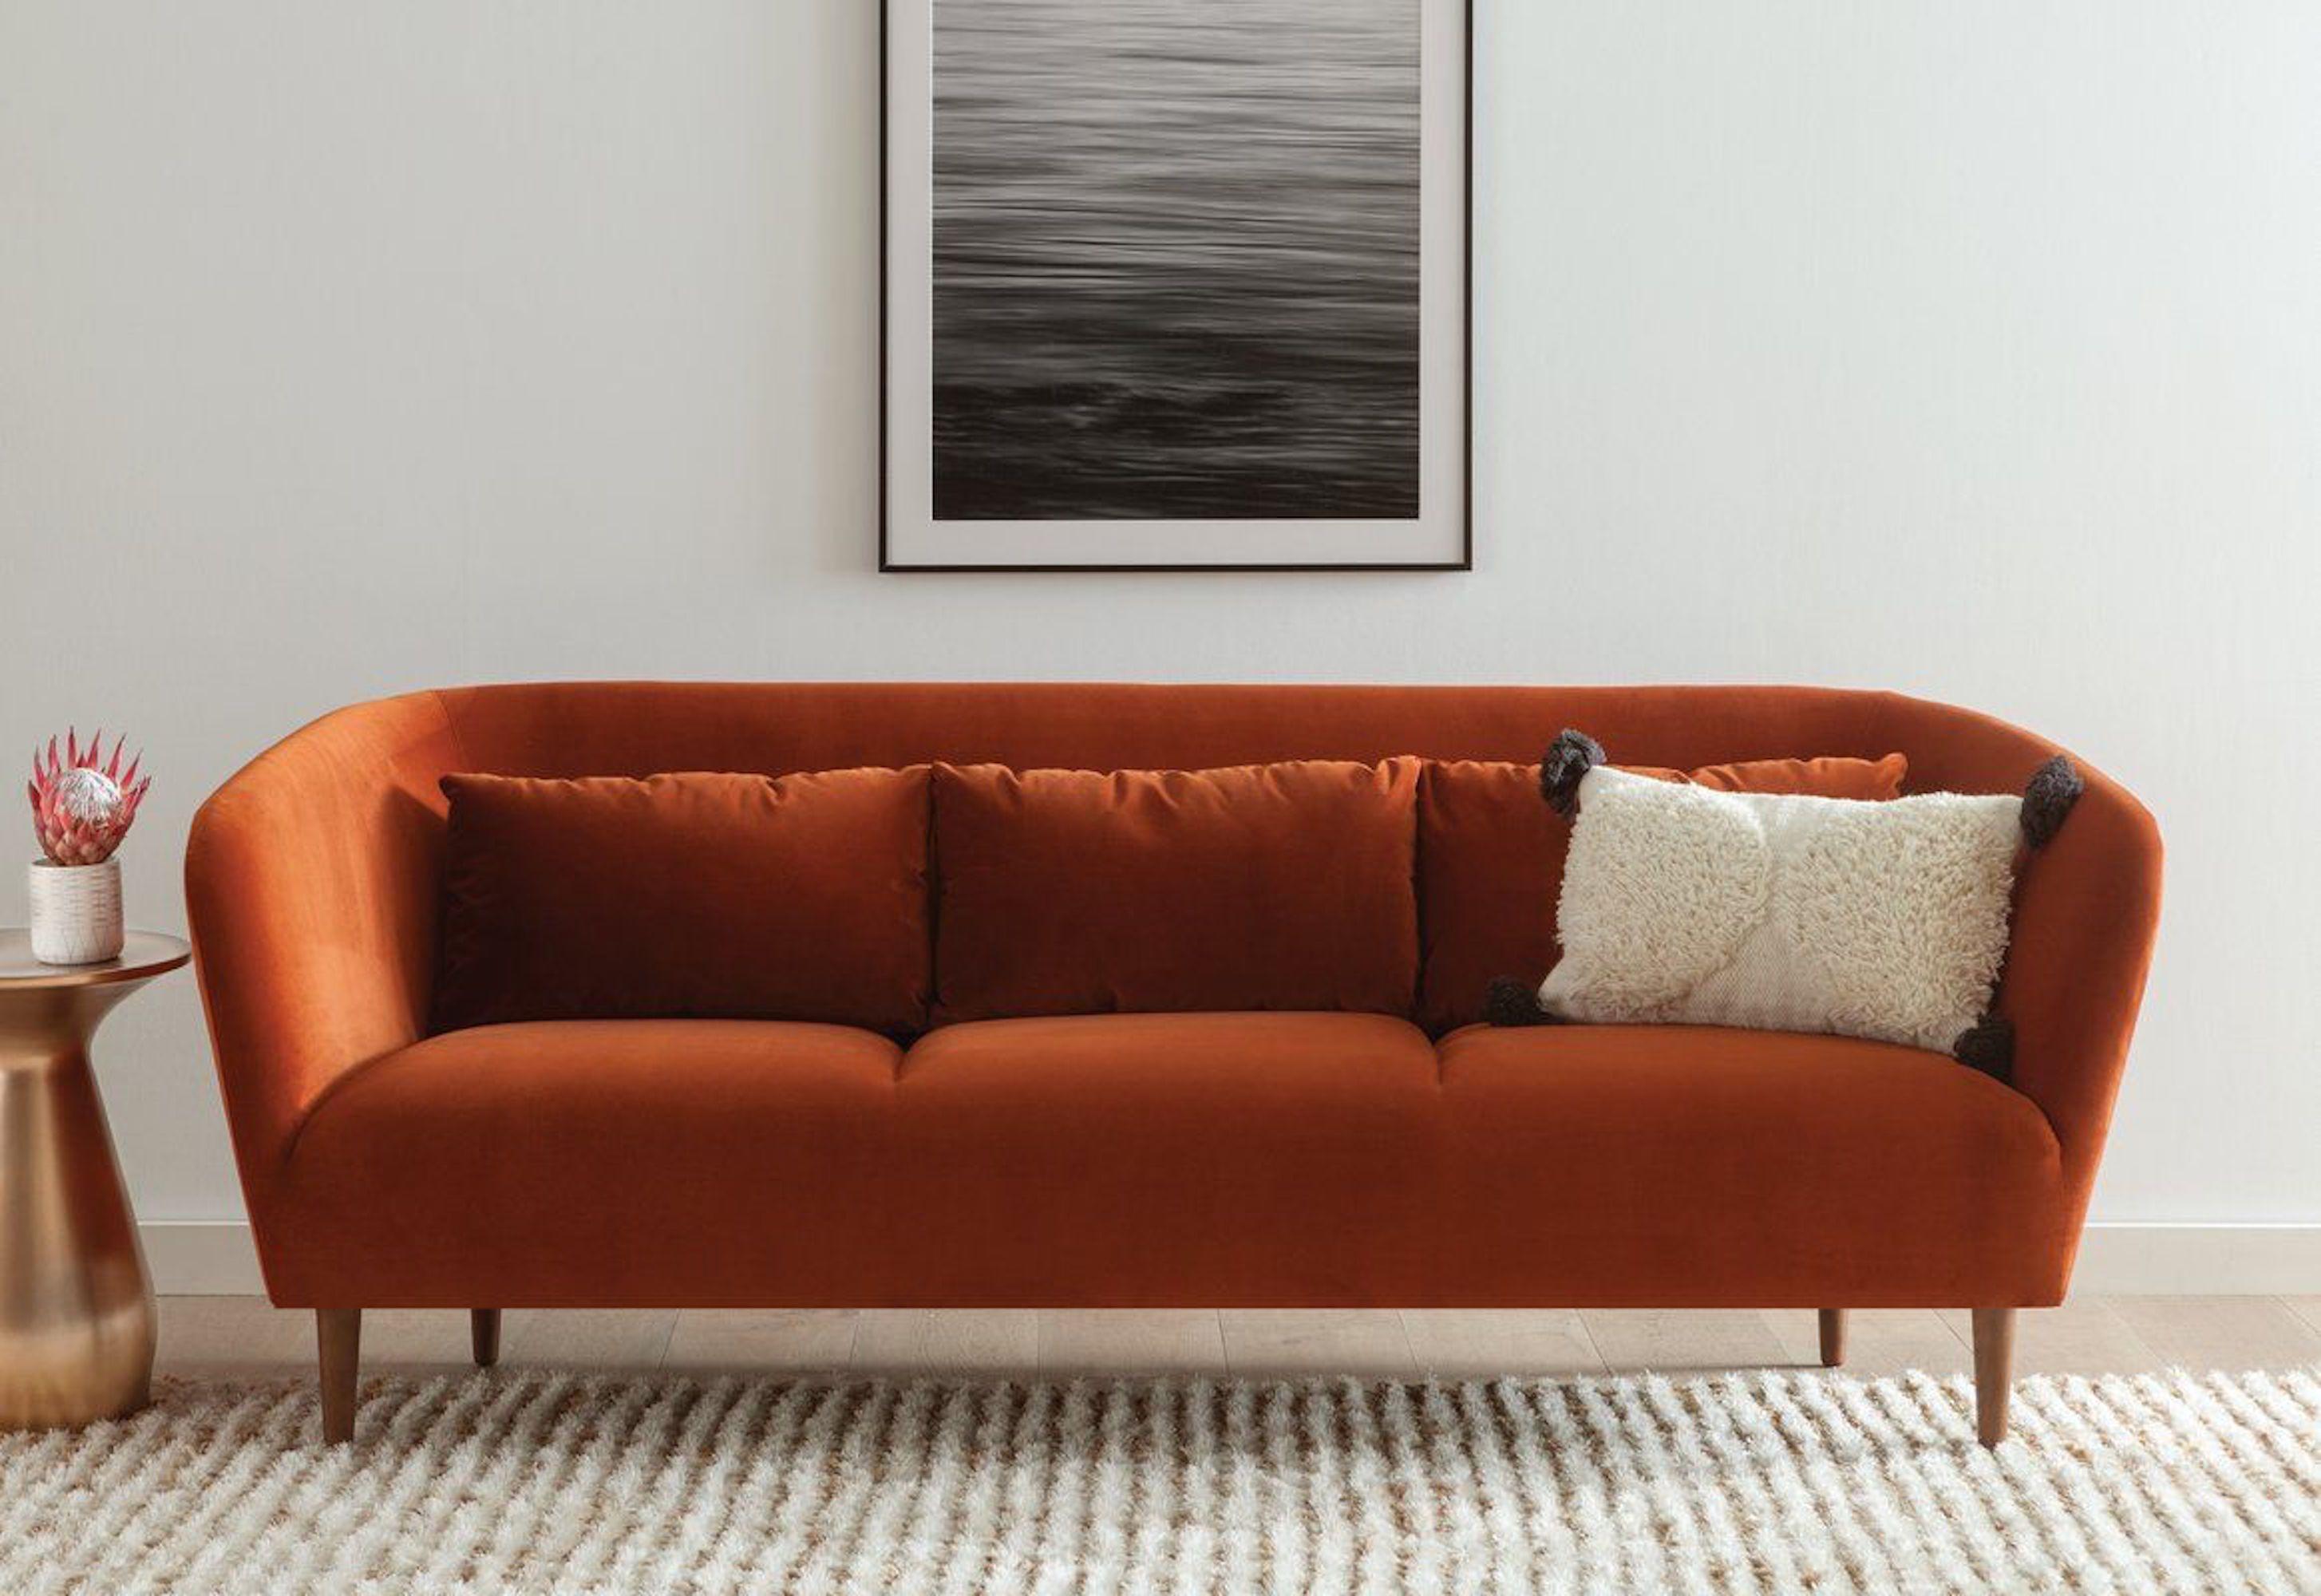 Best Wayfair Cyber Monday Deals 2018 Furniture & Decor Throughout Willa 80 Inch Tv Stands (View 19 of 30)